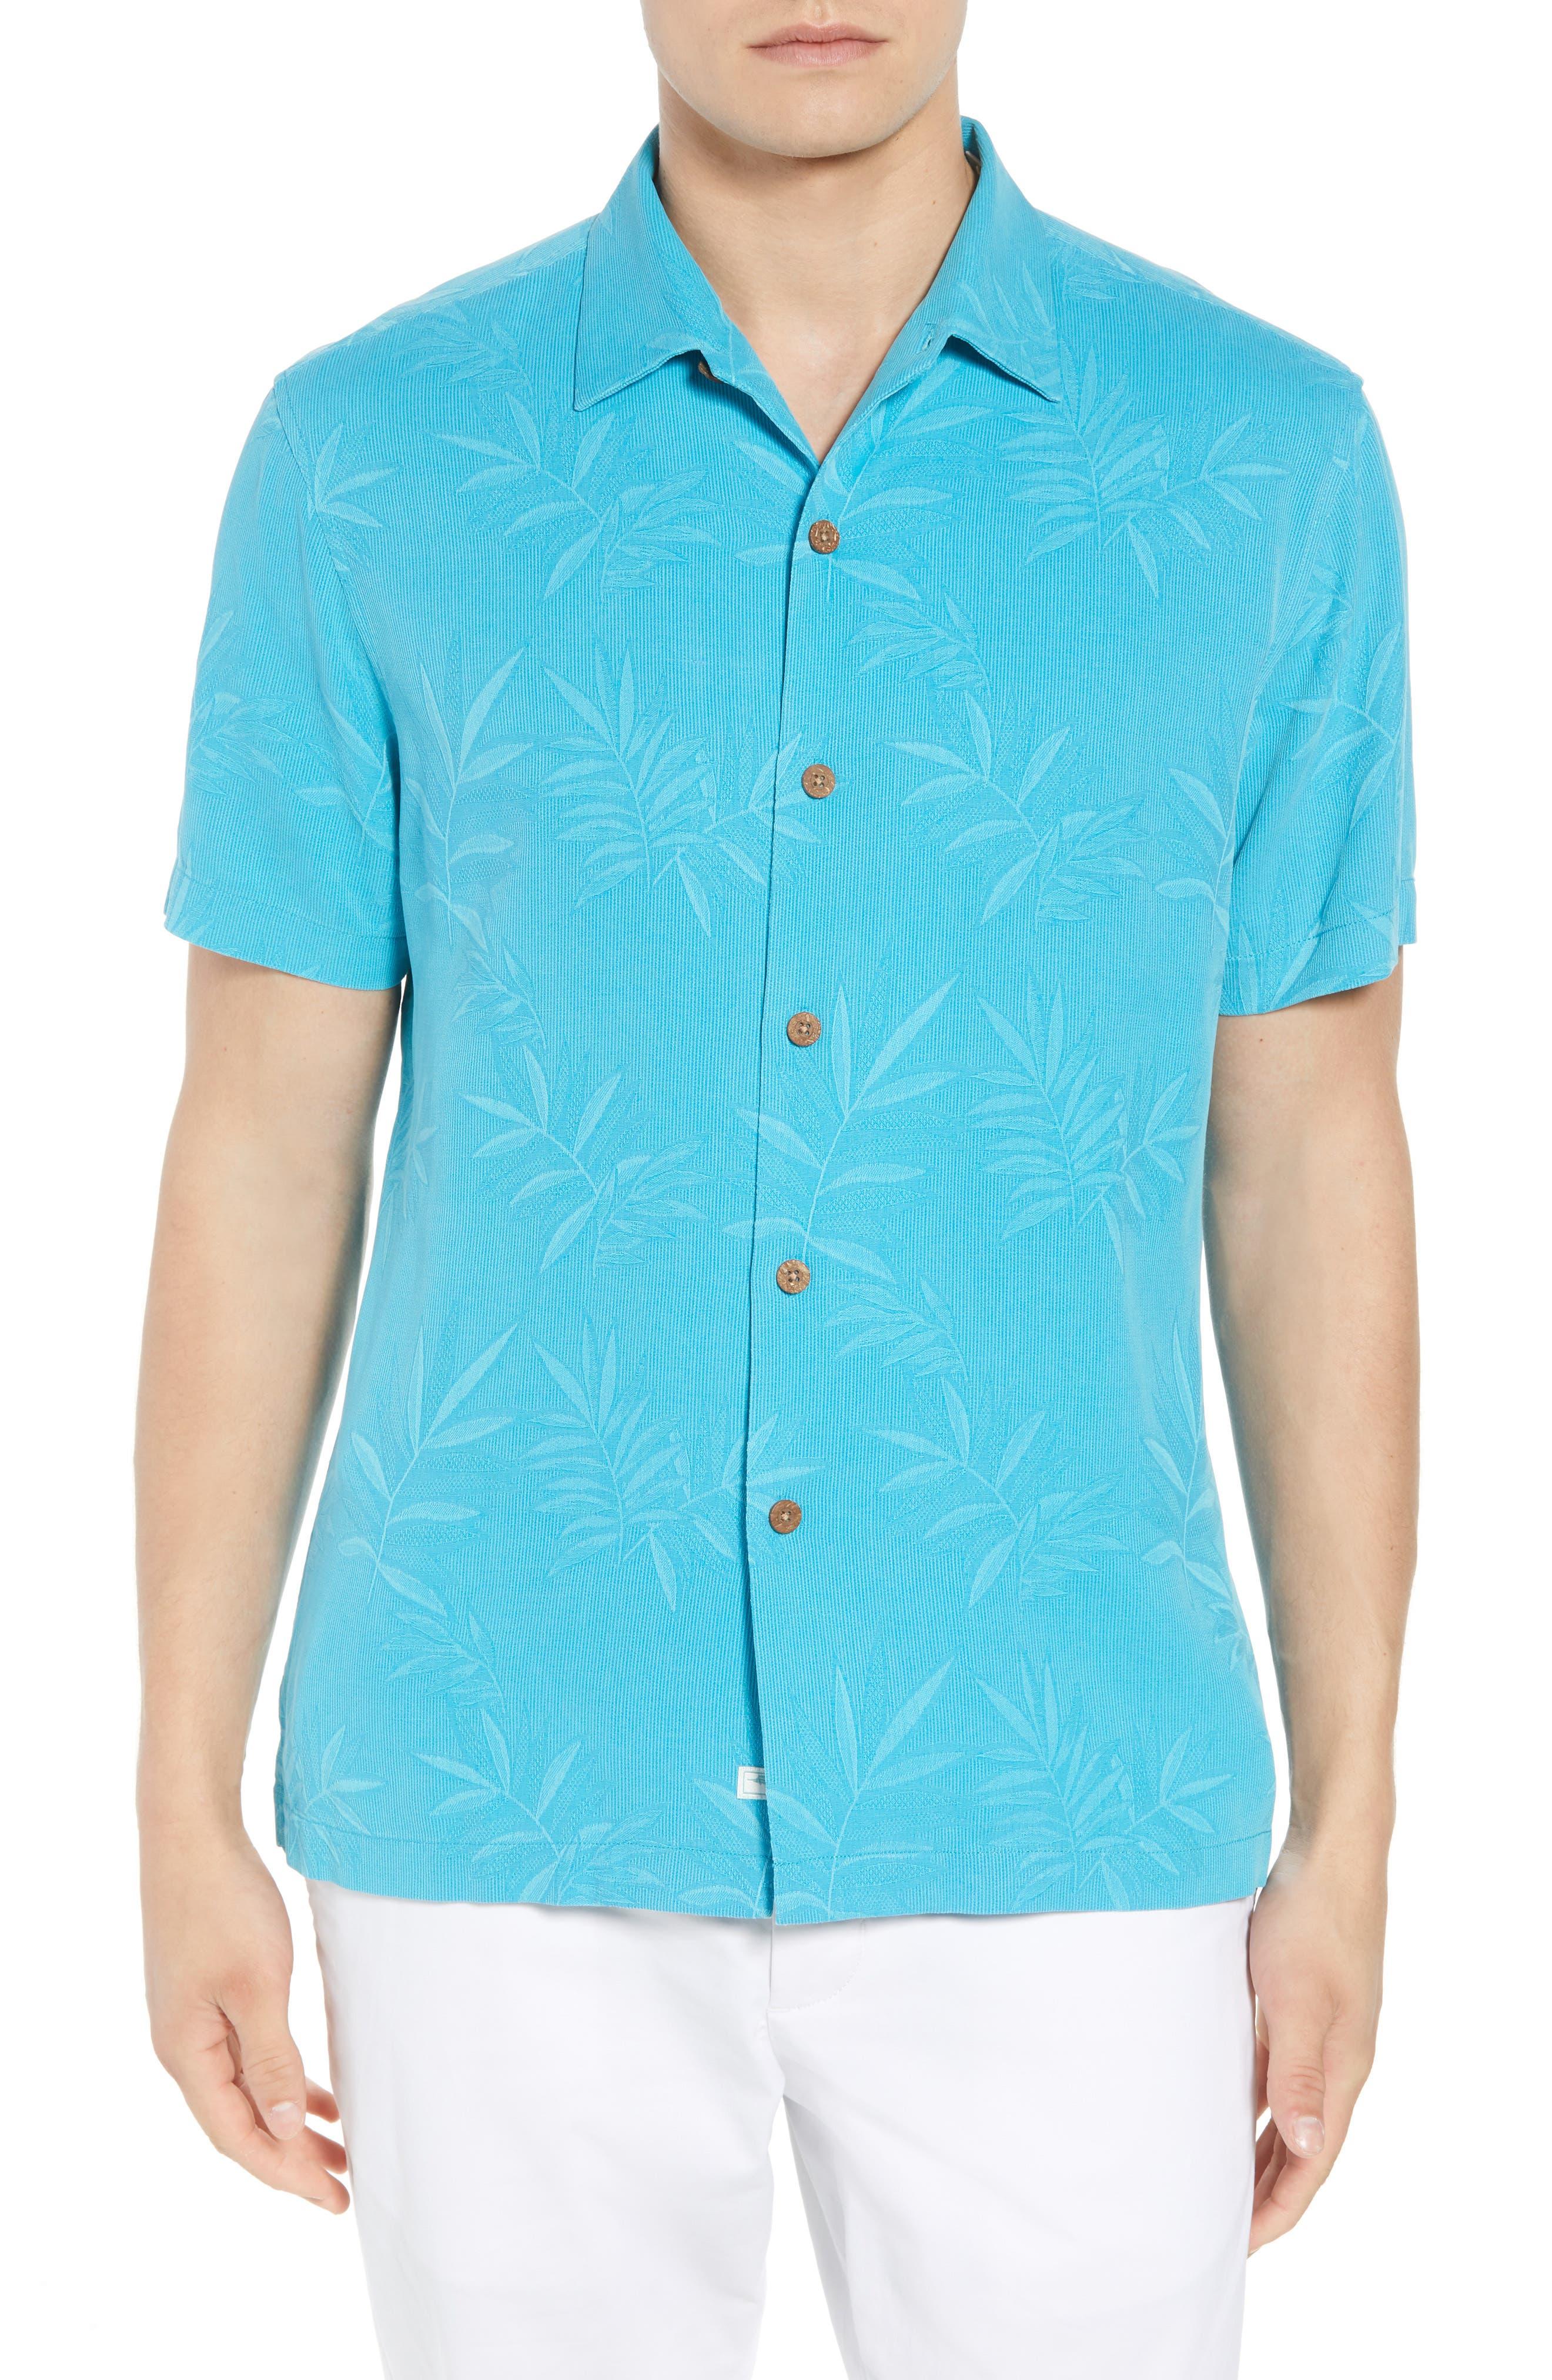 Luau Floral Silk Shirt,                             Main thumbnail 1, color,                             Pool Party Blue